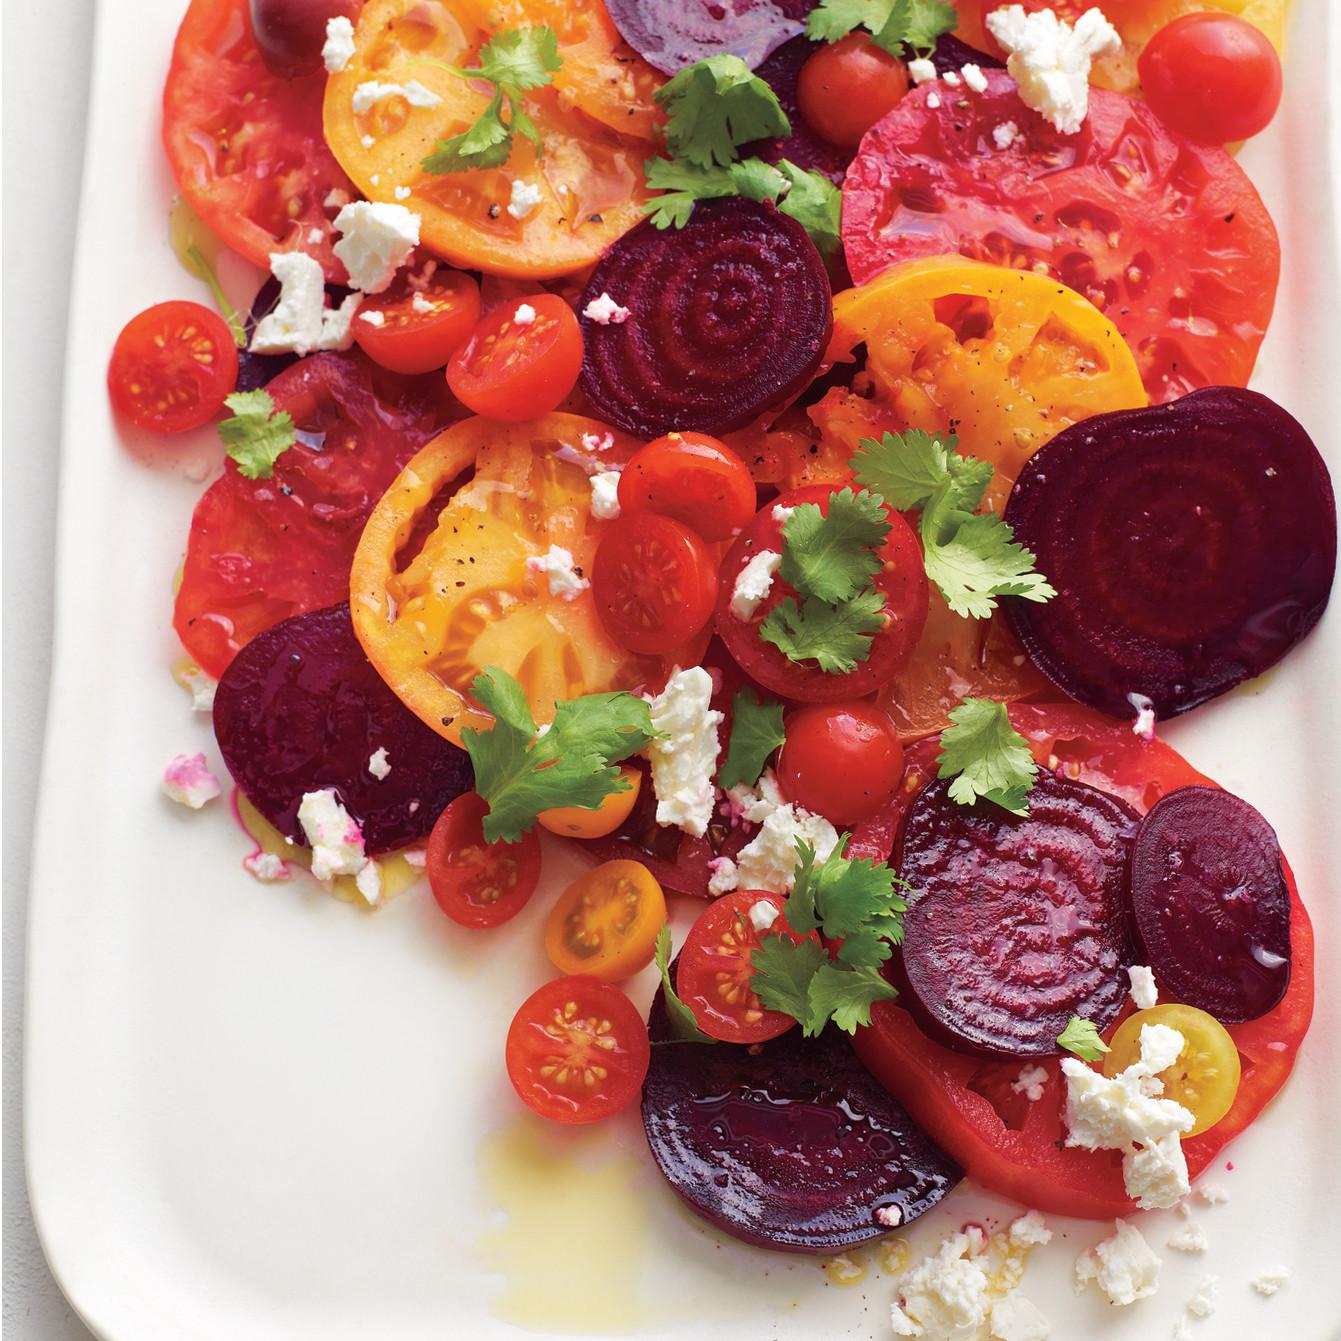 tomato-beet-salad-med108588_sq.jpg?itok=tfURE1ep